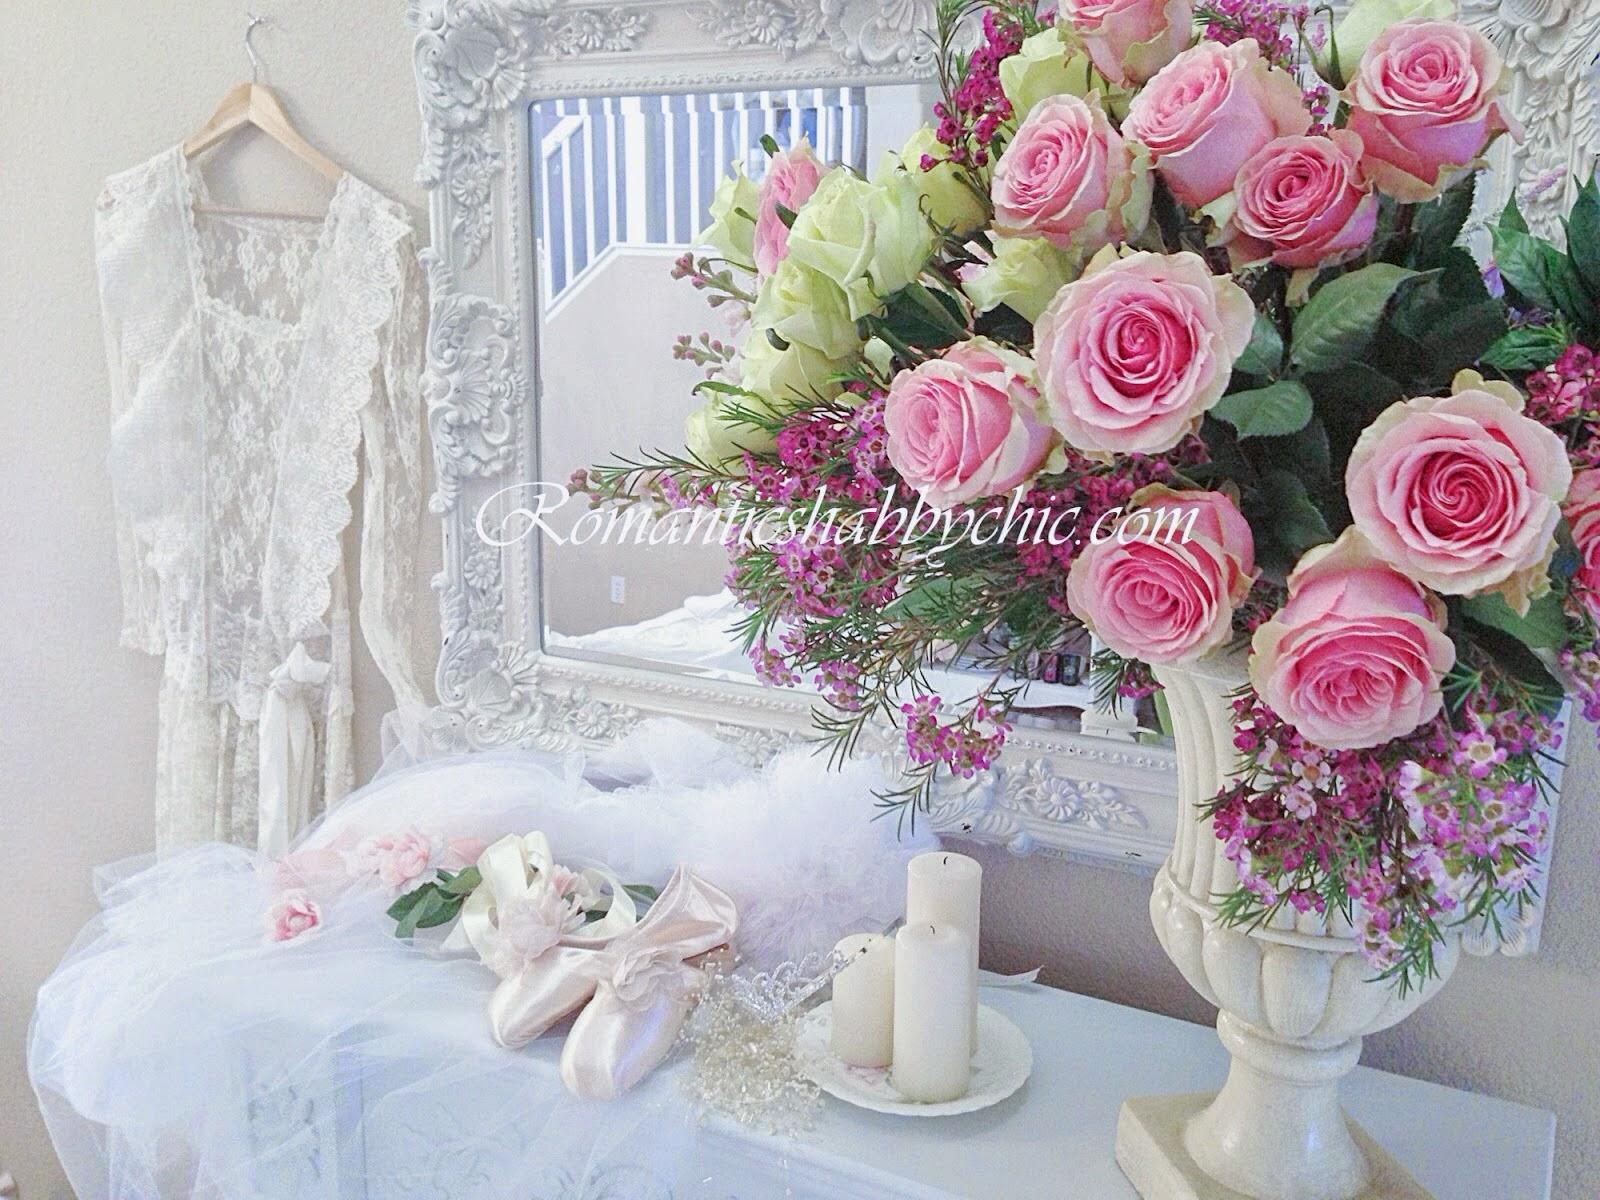 Romantic shabby chic home romantic shabby chic blog - Romantic Shabby Chic Blog Magical Touches